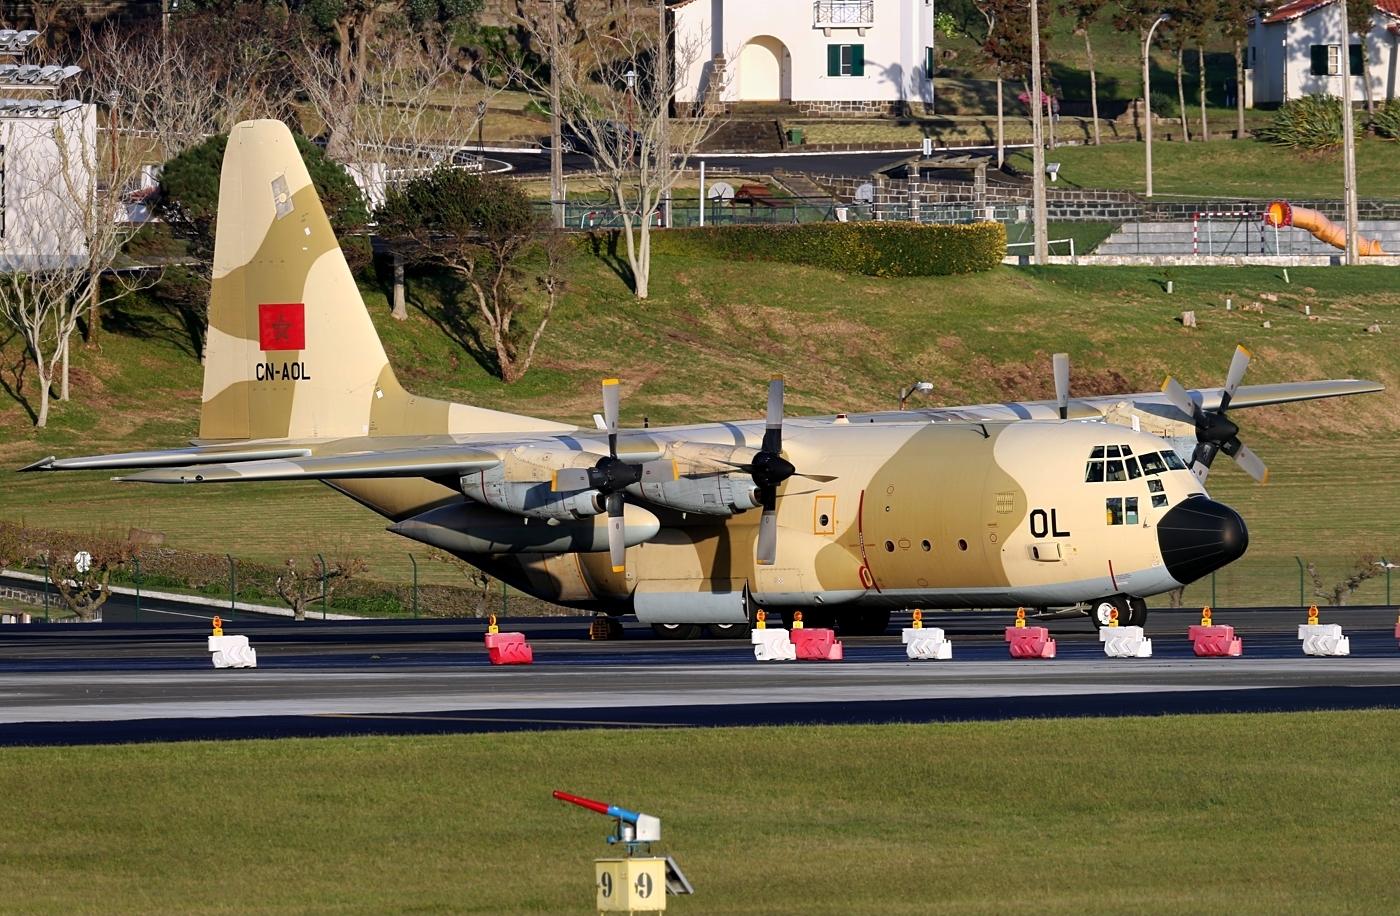 FRA: Photos d'avions de transport - Page 31 35789348835_c3f1e327d3_o